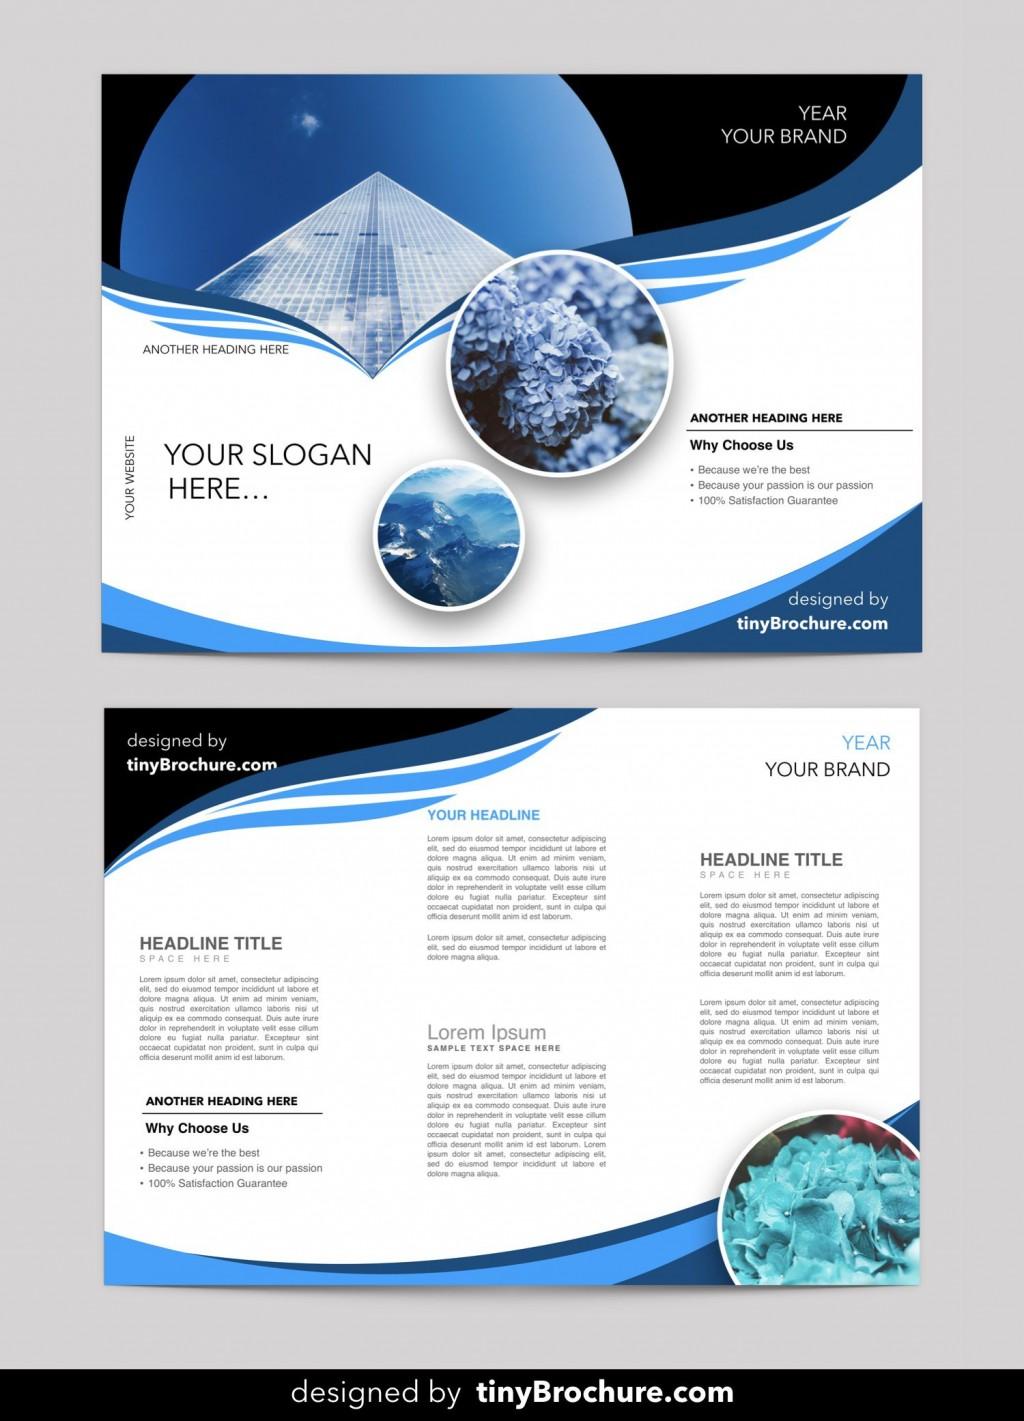 002 Wonderful Free Editable Flyer Template Picture  Busines FundraisingLarge